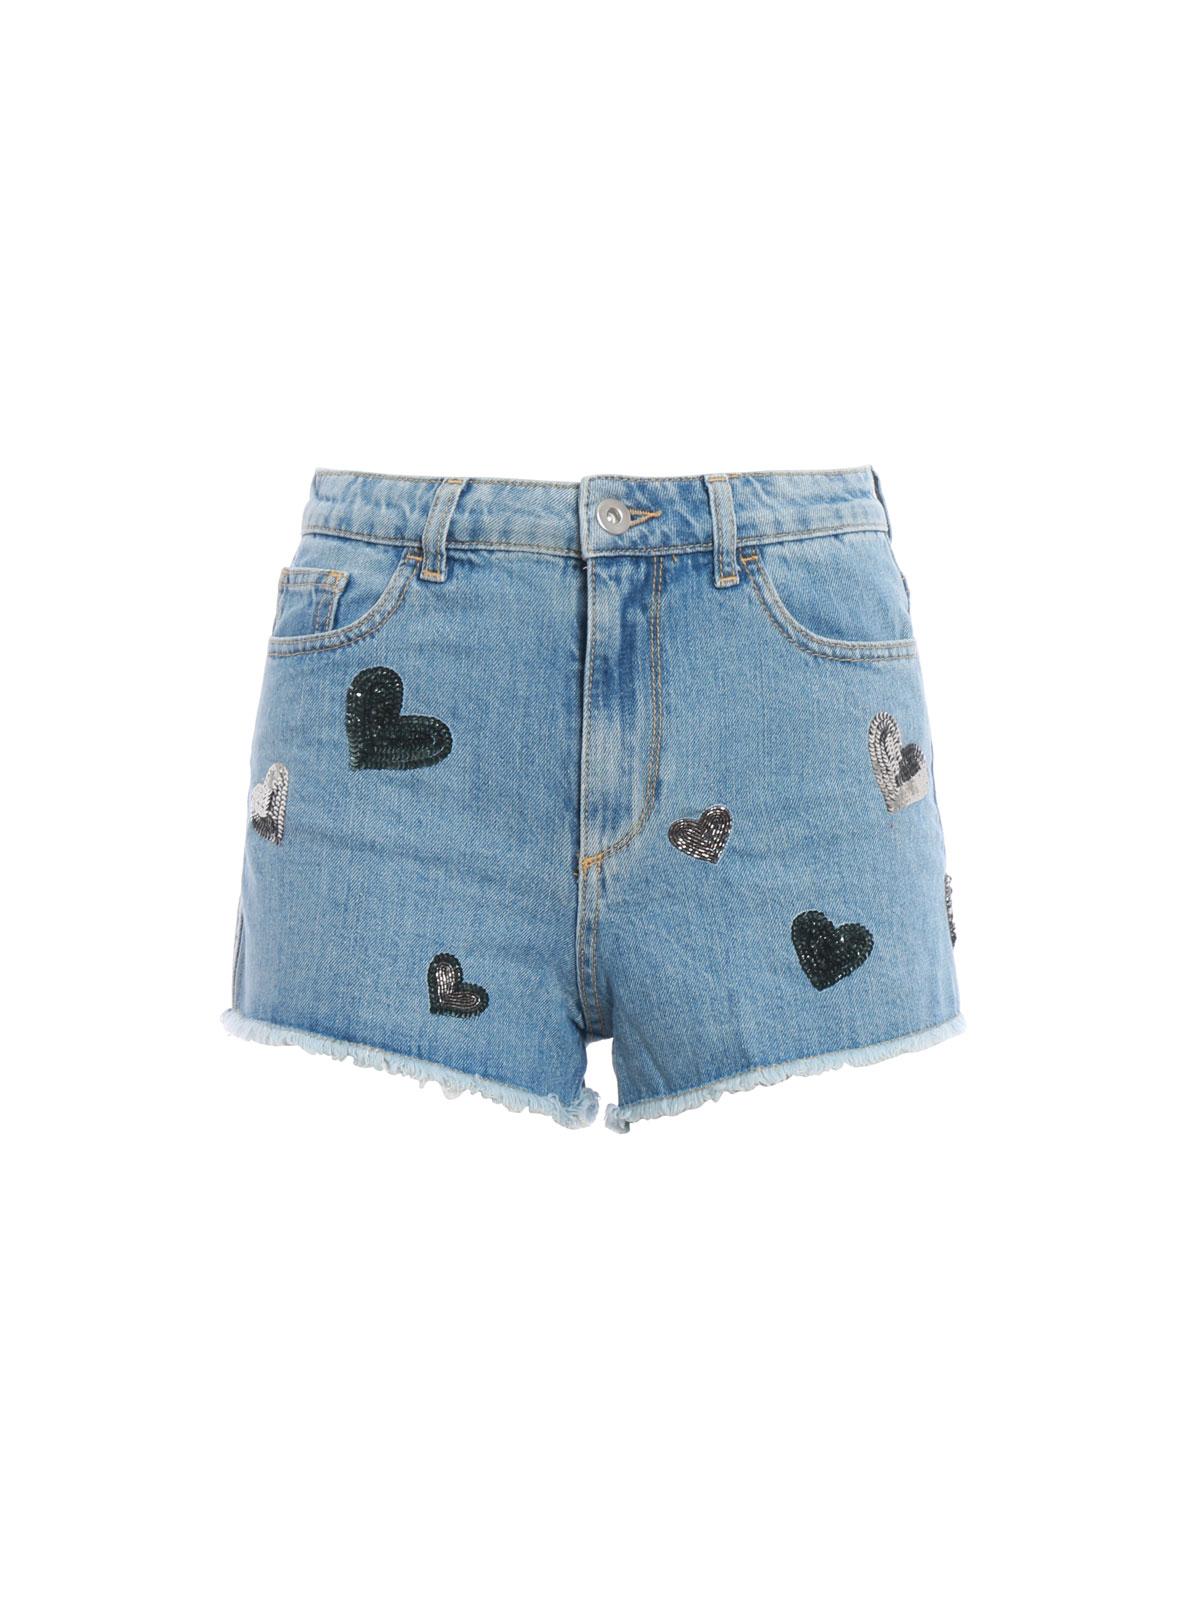 972317d566 CHIARA FERRAGNI: Trousers Shorts - Flirting sequin heart denim shorts